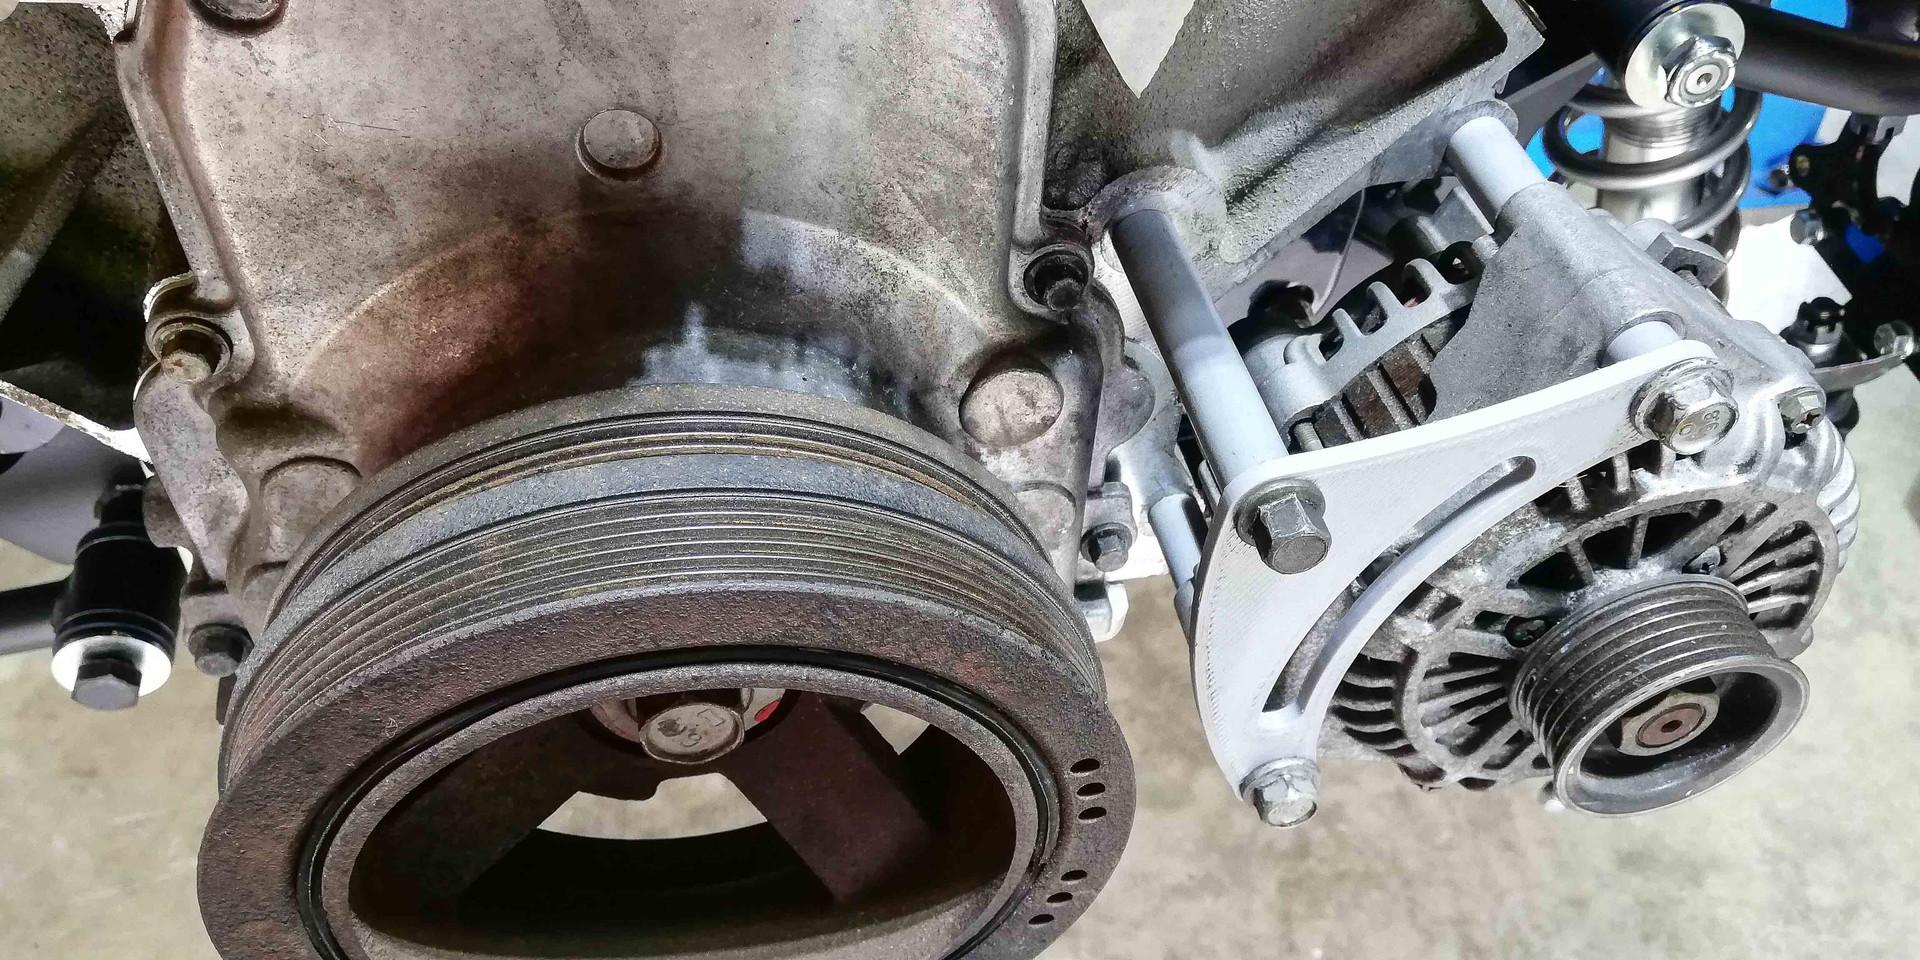 Design and 3D print alternator bracket prototype.